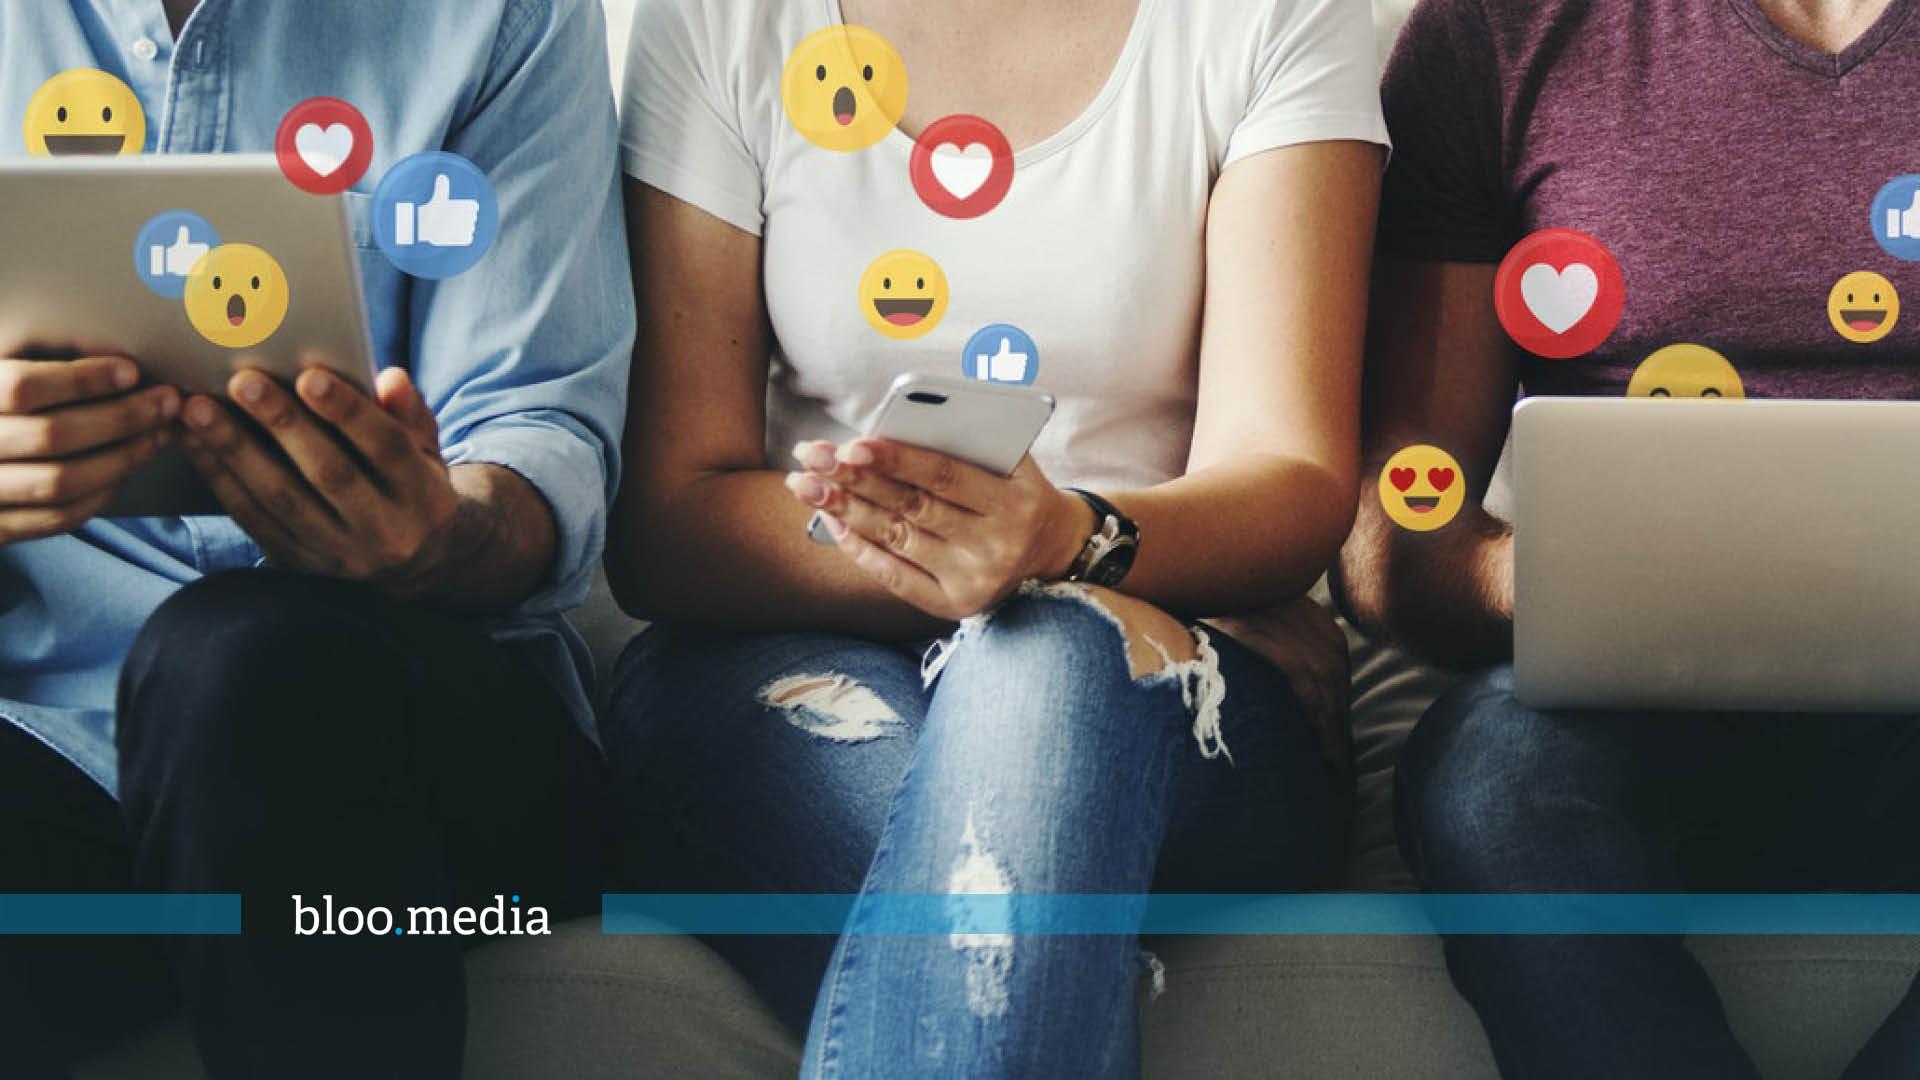 Engagement en Redes Sociales [Instagram, Facebook, Twitter]